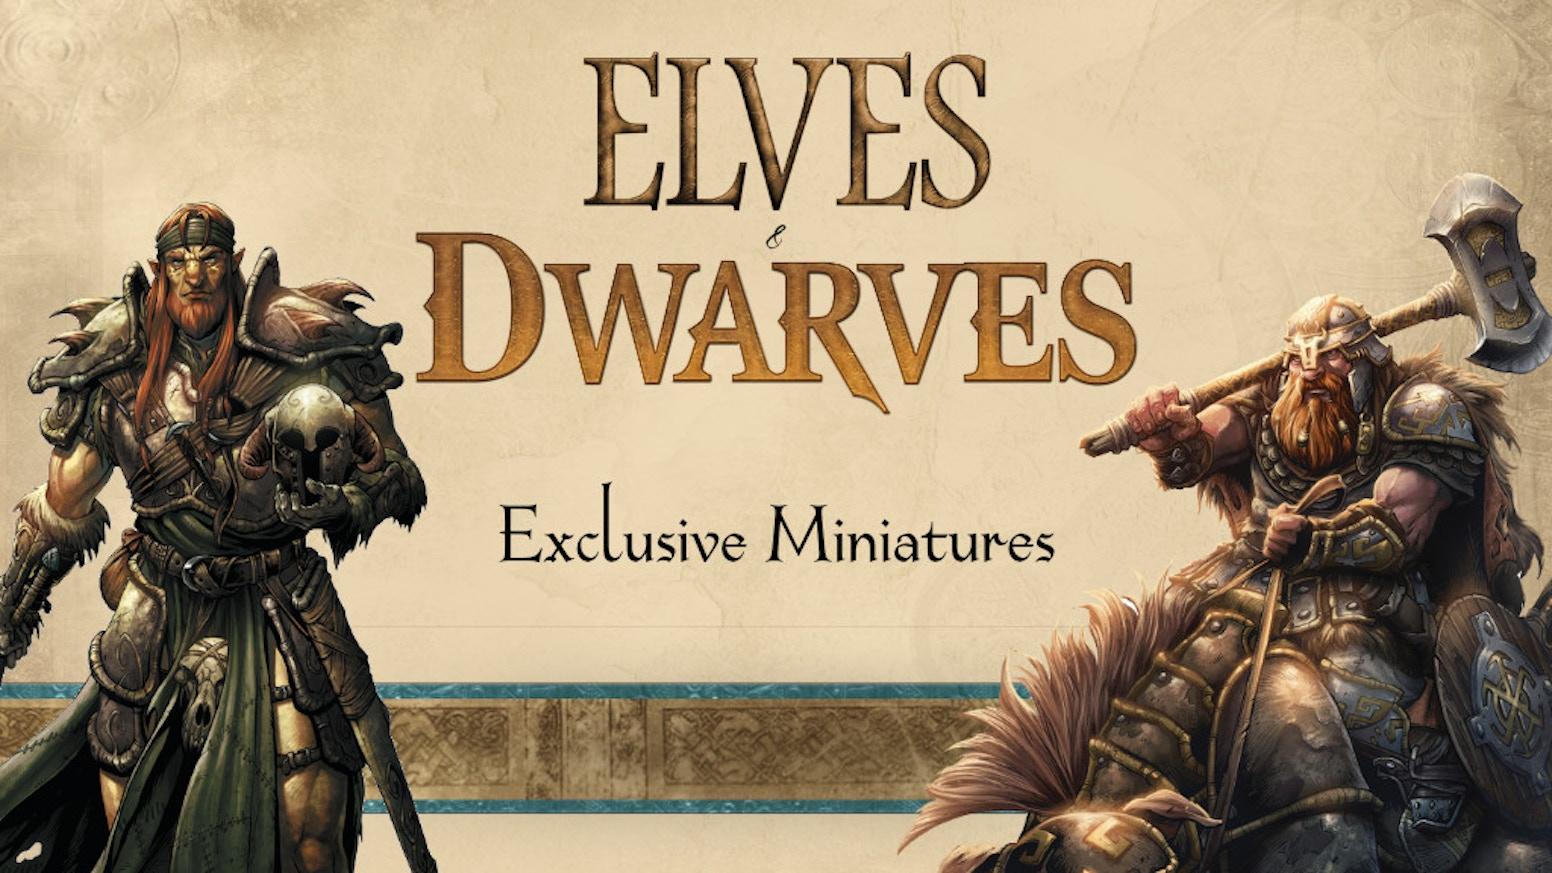 the lands of arran elves dwarves ks exclusive miniatures by